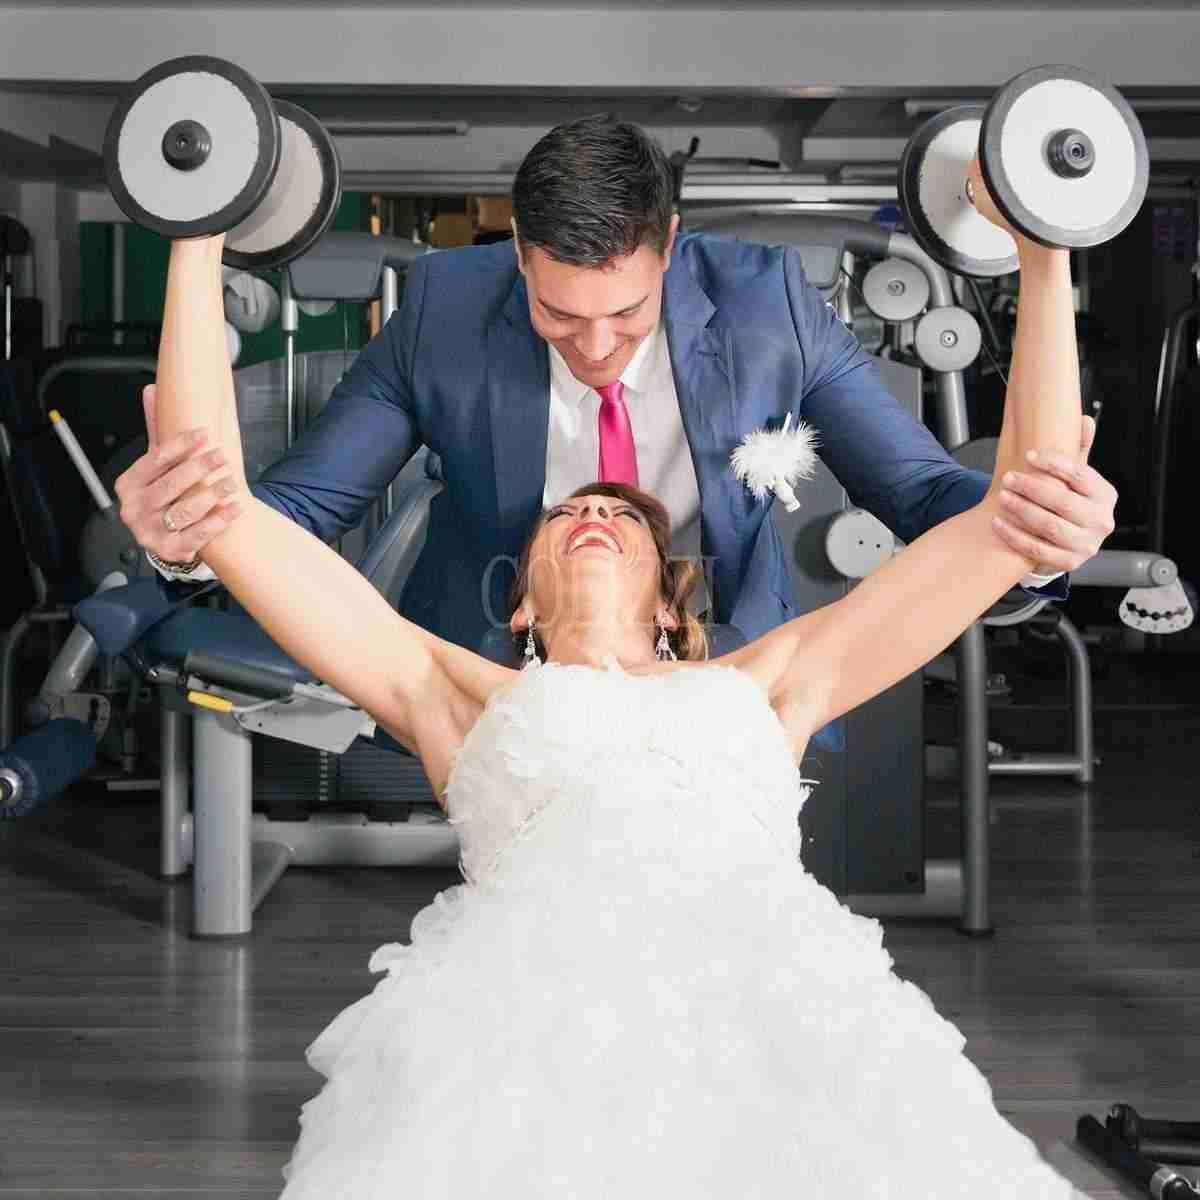 Wedding Personal Trainer